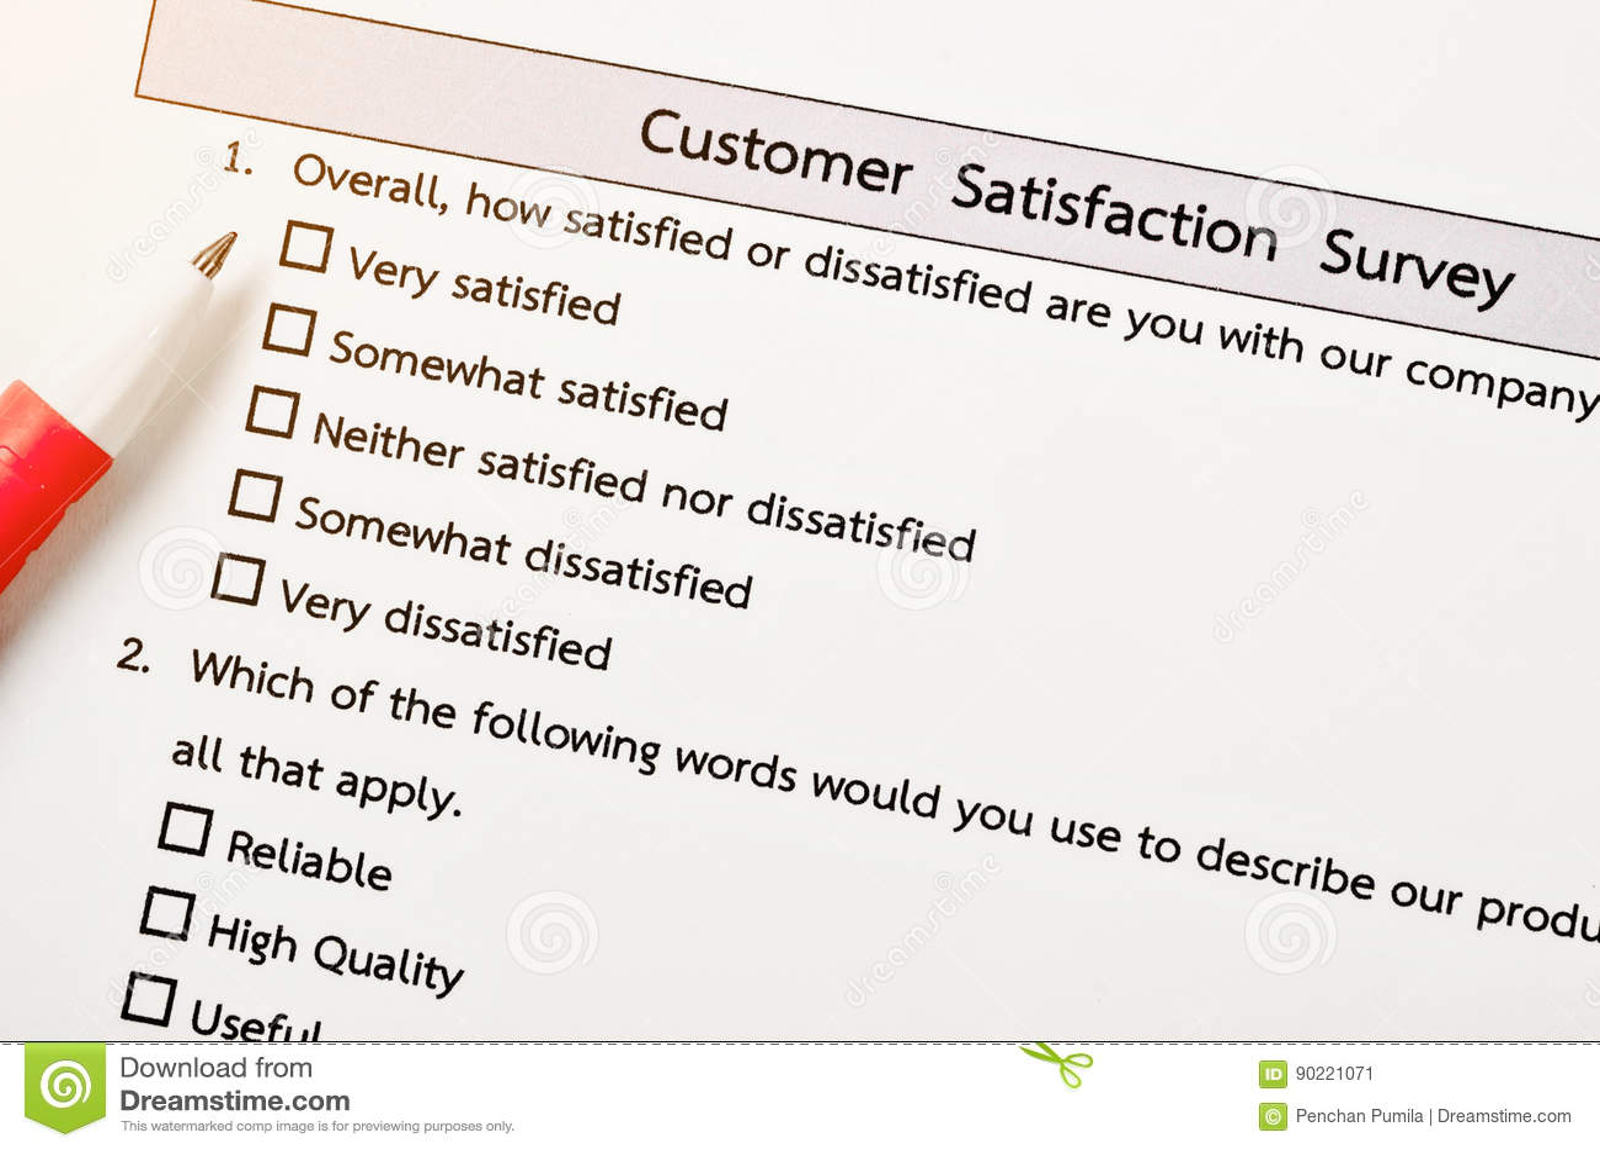 Customer Satisfactory Survey Form  Stock Image - Image of